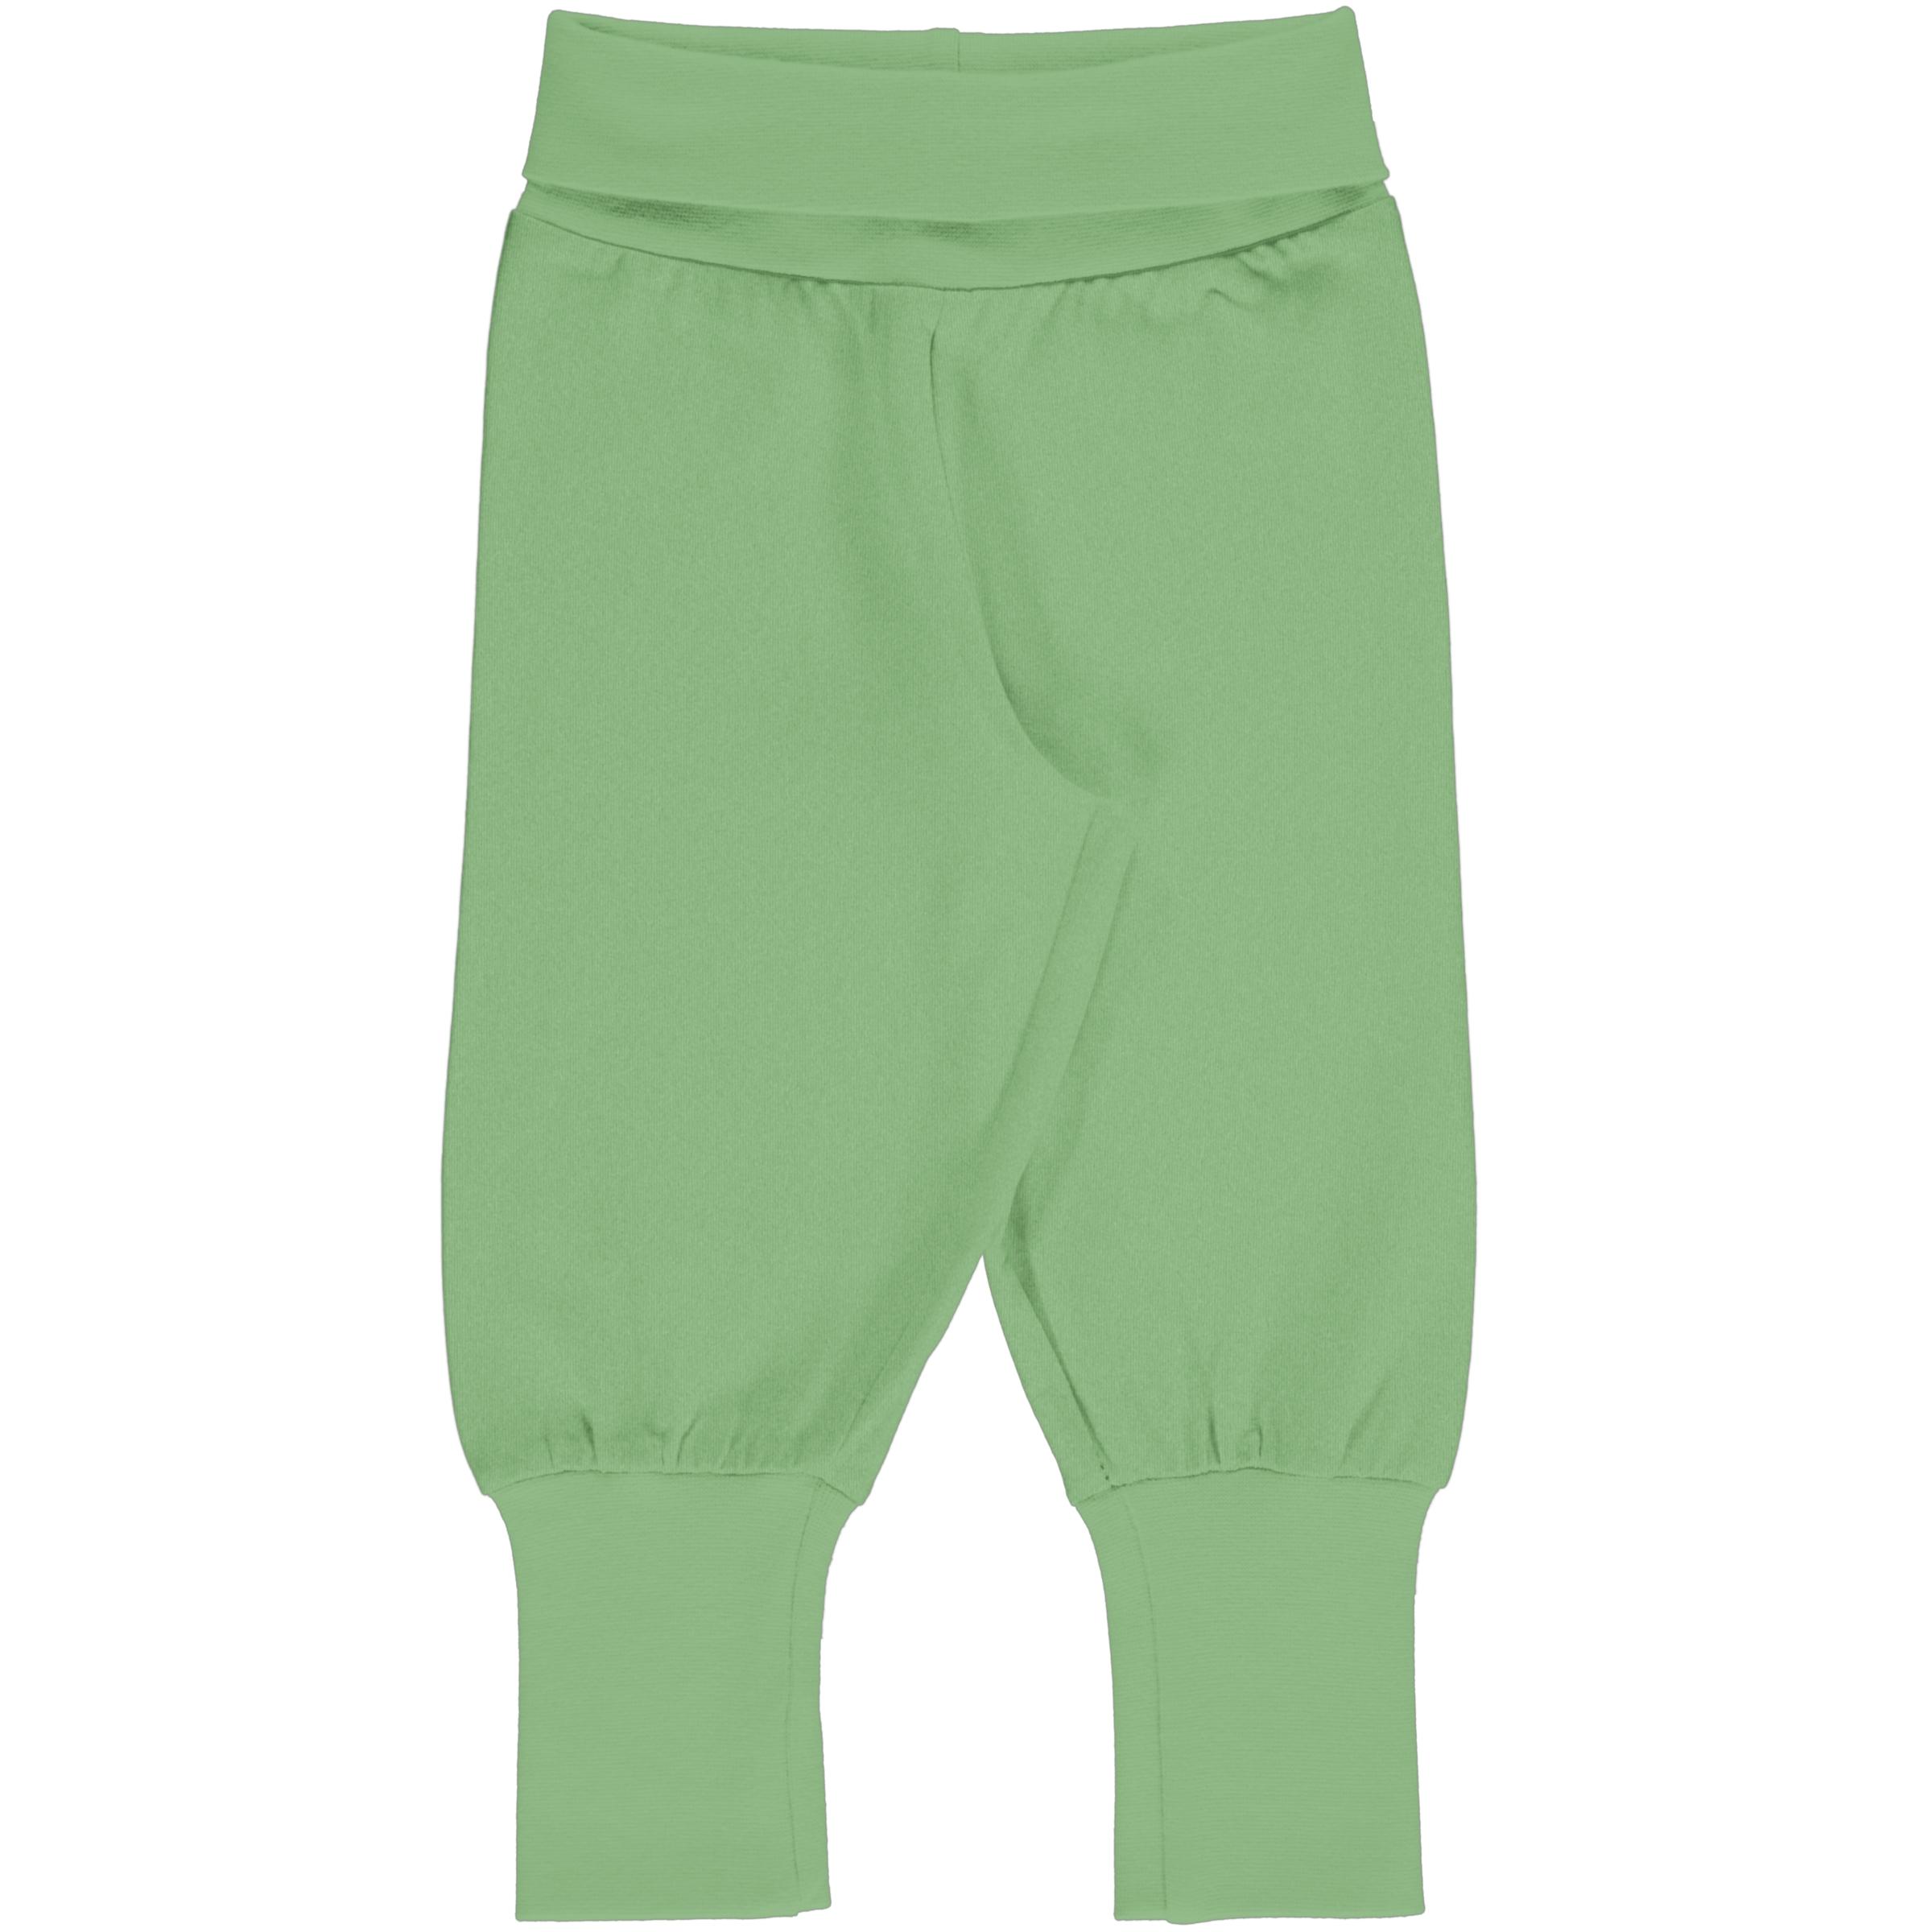 Meyadey by Maxomorra Baby Rib Pants Solid GREENGAGE 74/80